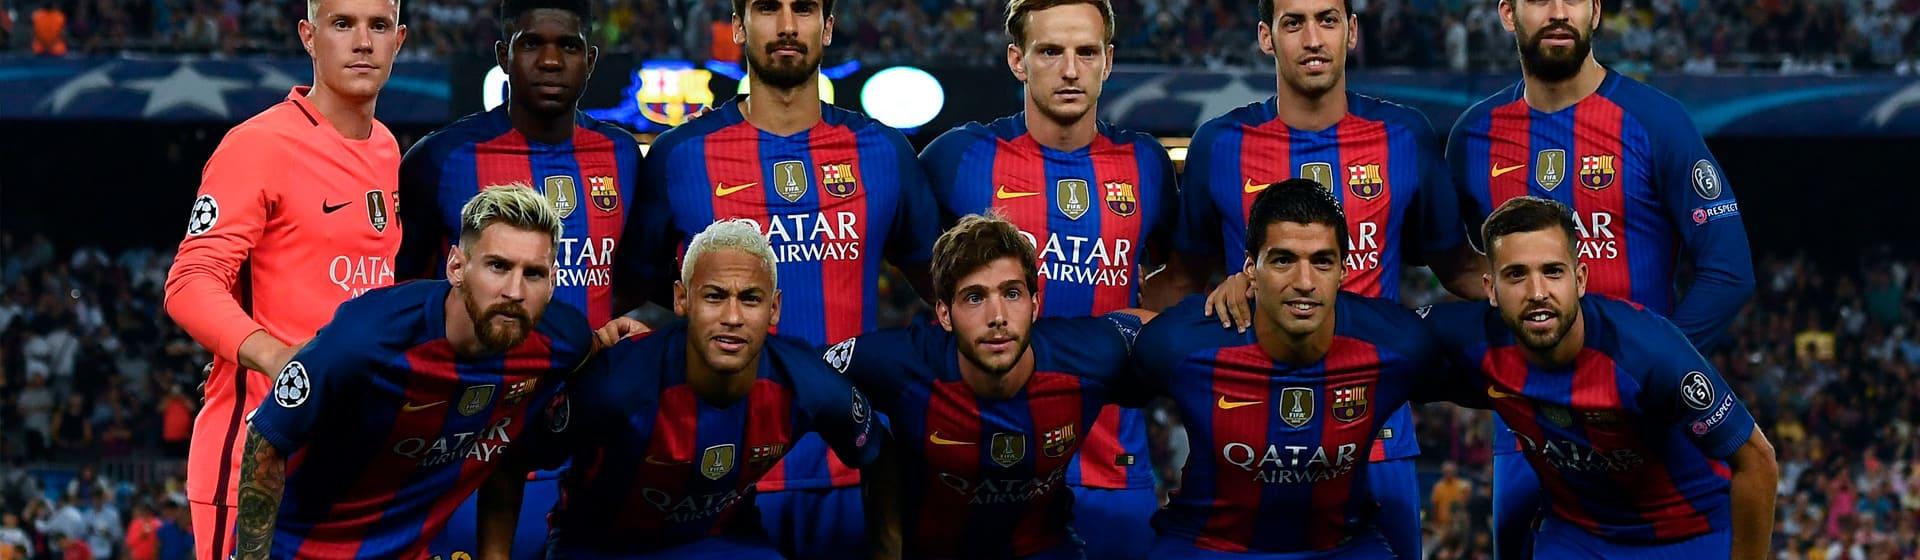 FC Barcelona - Мерч и одежда с атрибутикой